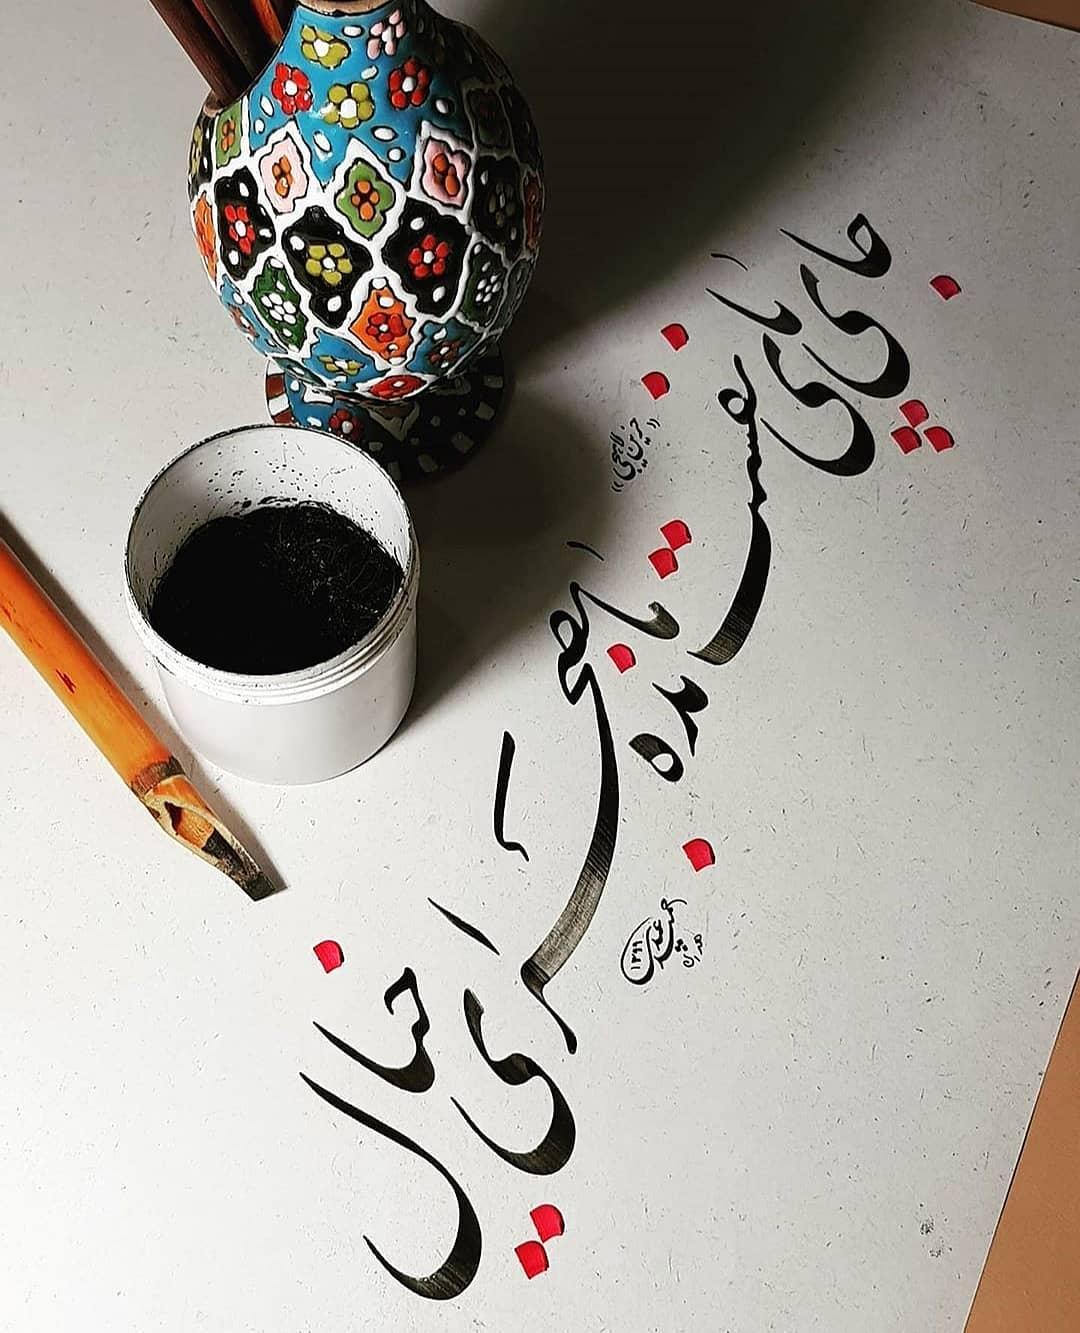 Farisi/Nasta'liq khatestan  ﷽ جای پای نفست مانده به صحرای خیال . #خطستان  @khatestan #خط_خودکاری#خط_خودکاری… 1368